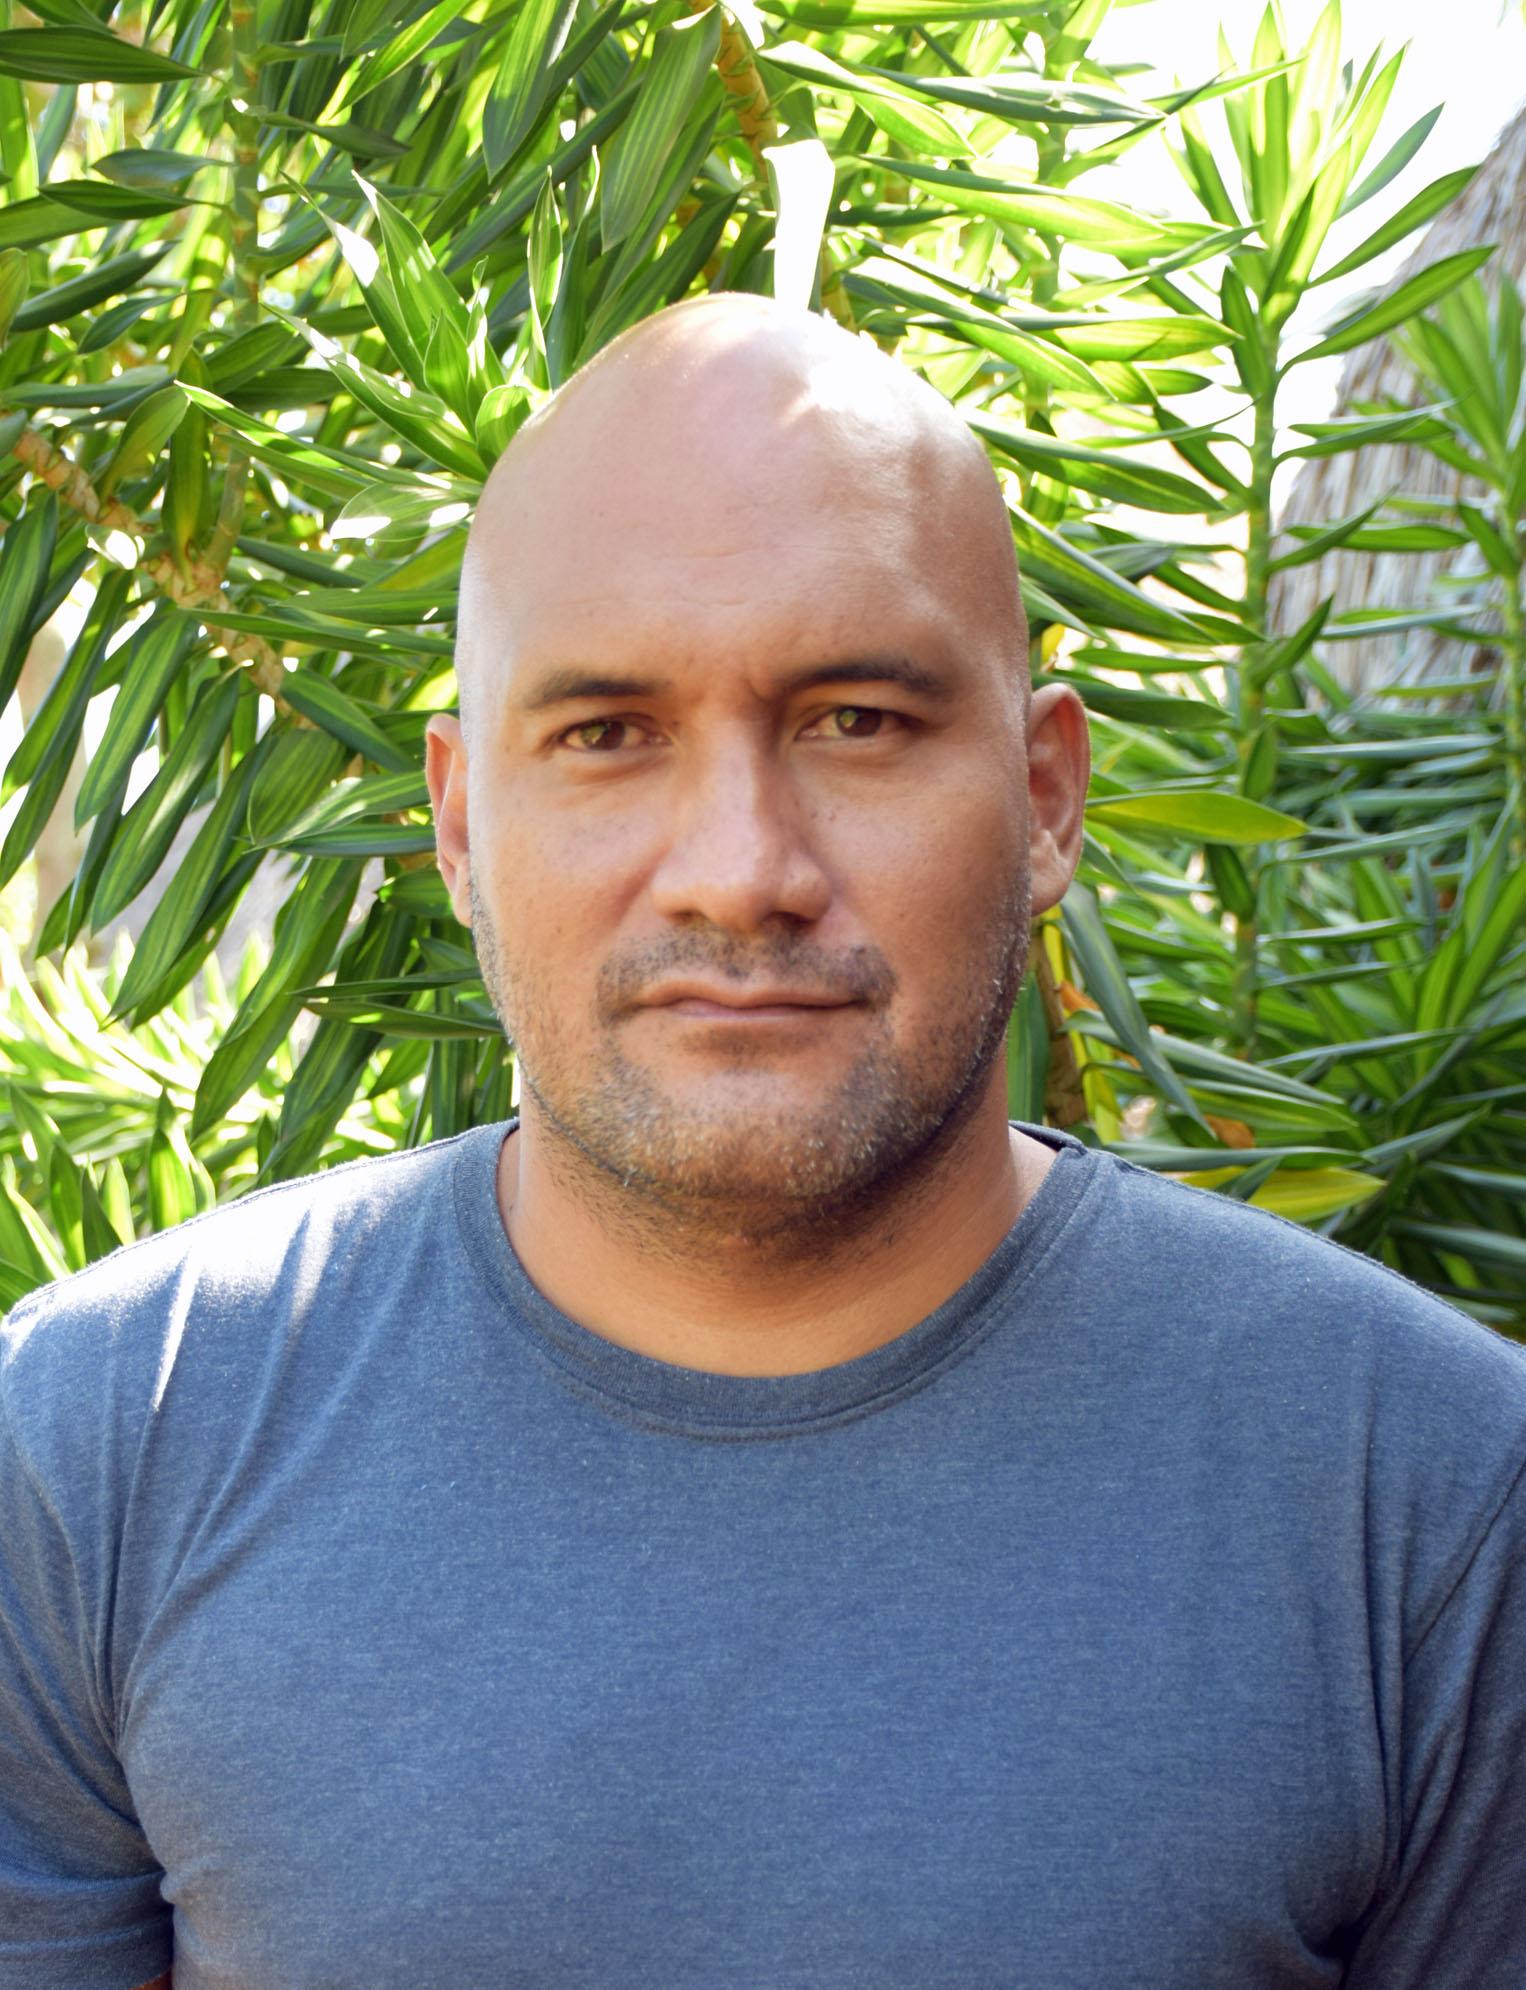 Tetuahau Temaru élu 3ème adjoint au maire de Faa'a